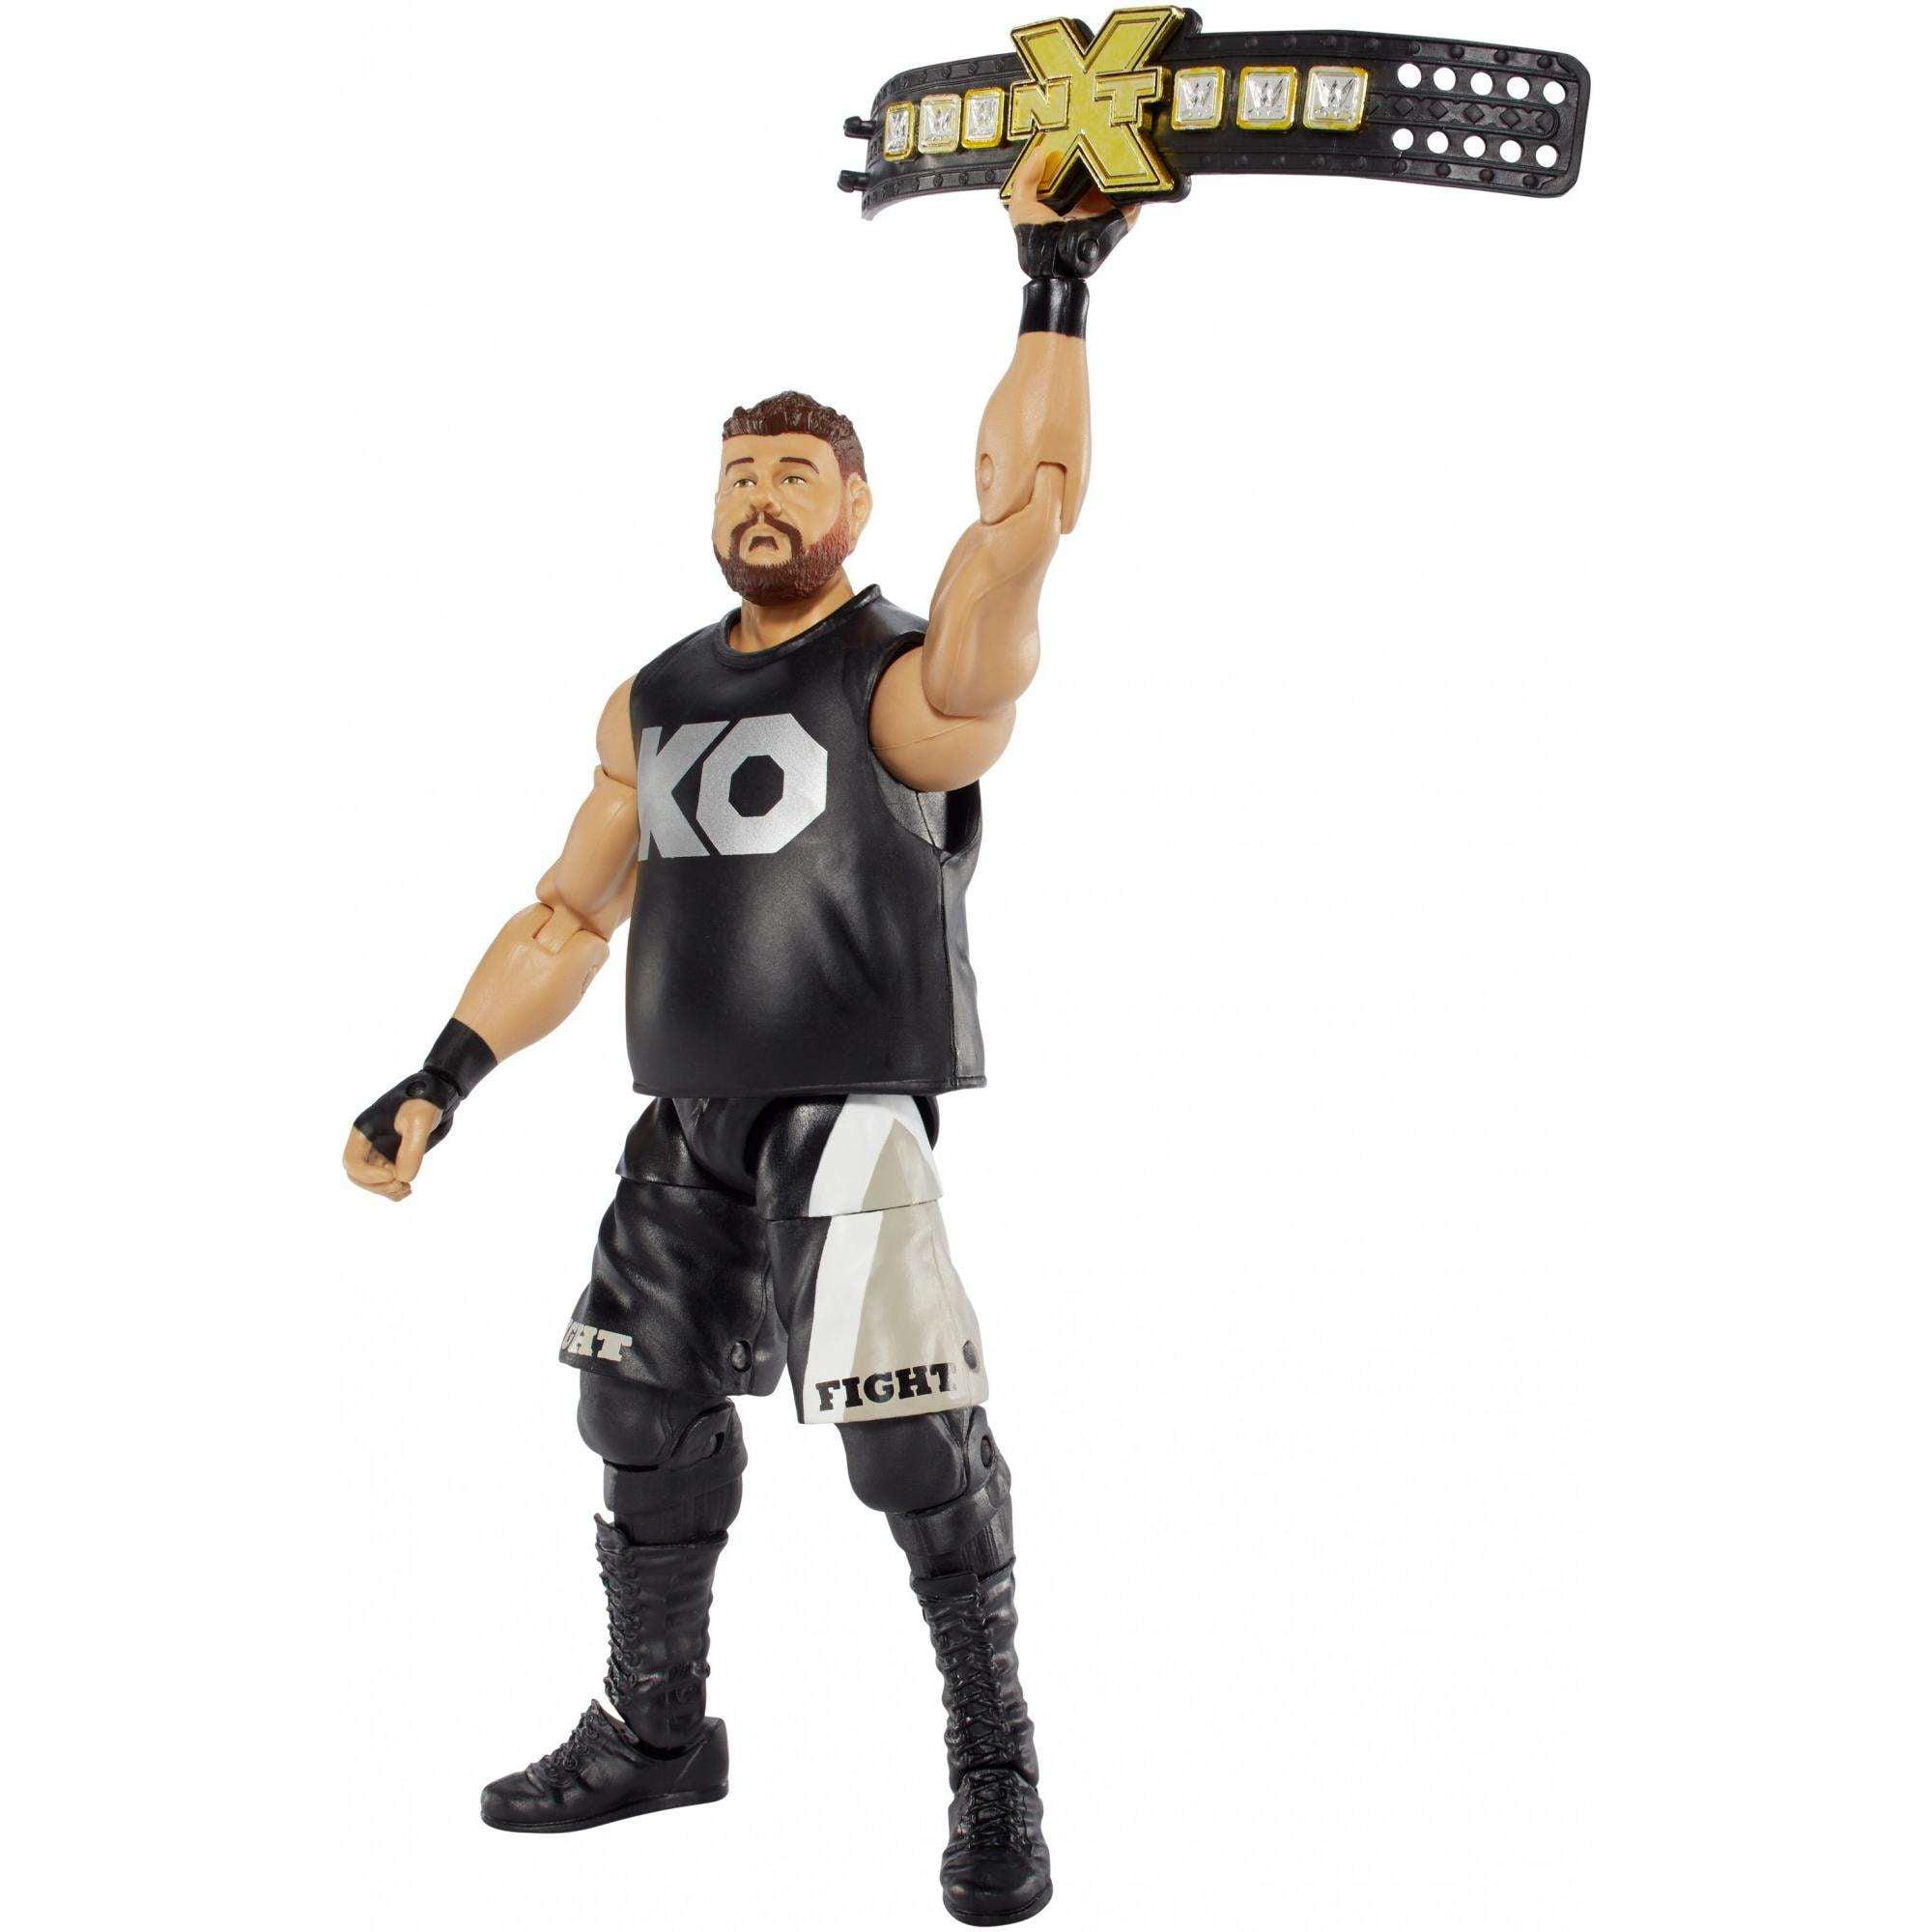 WWE Elite Kevin Owens Action Figure by Mattel